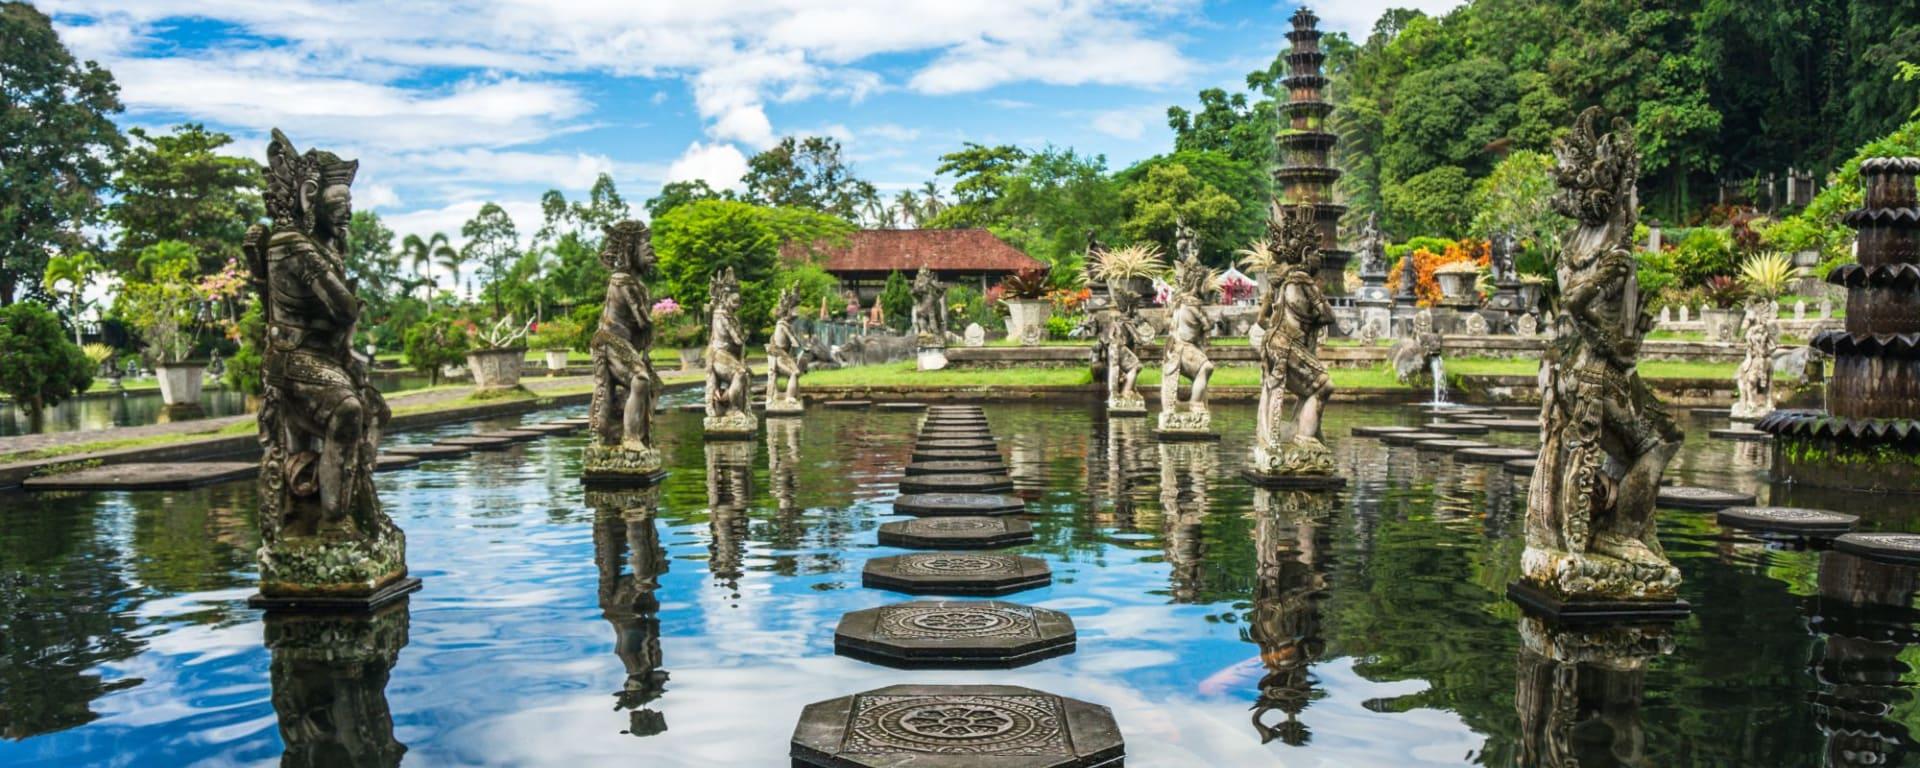 Höhepunkte Balis ab Südbali: Bali Tirta Gangga Water Temple